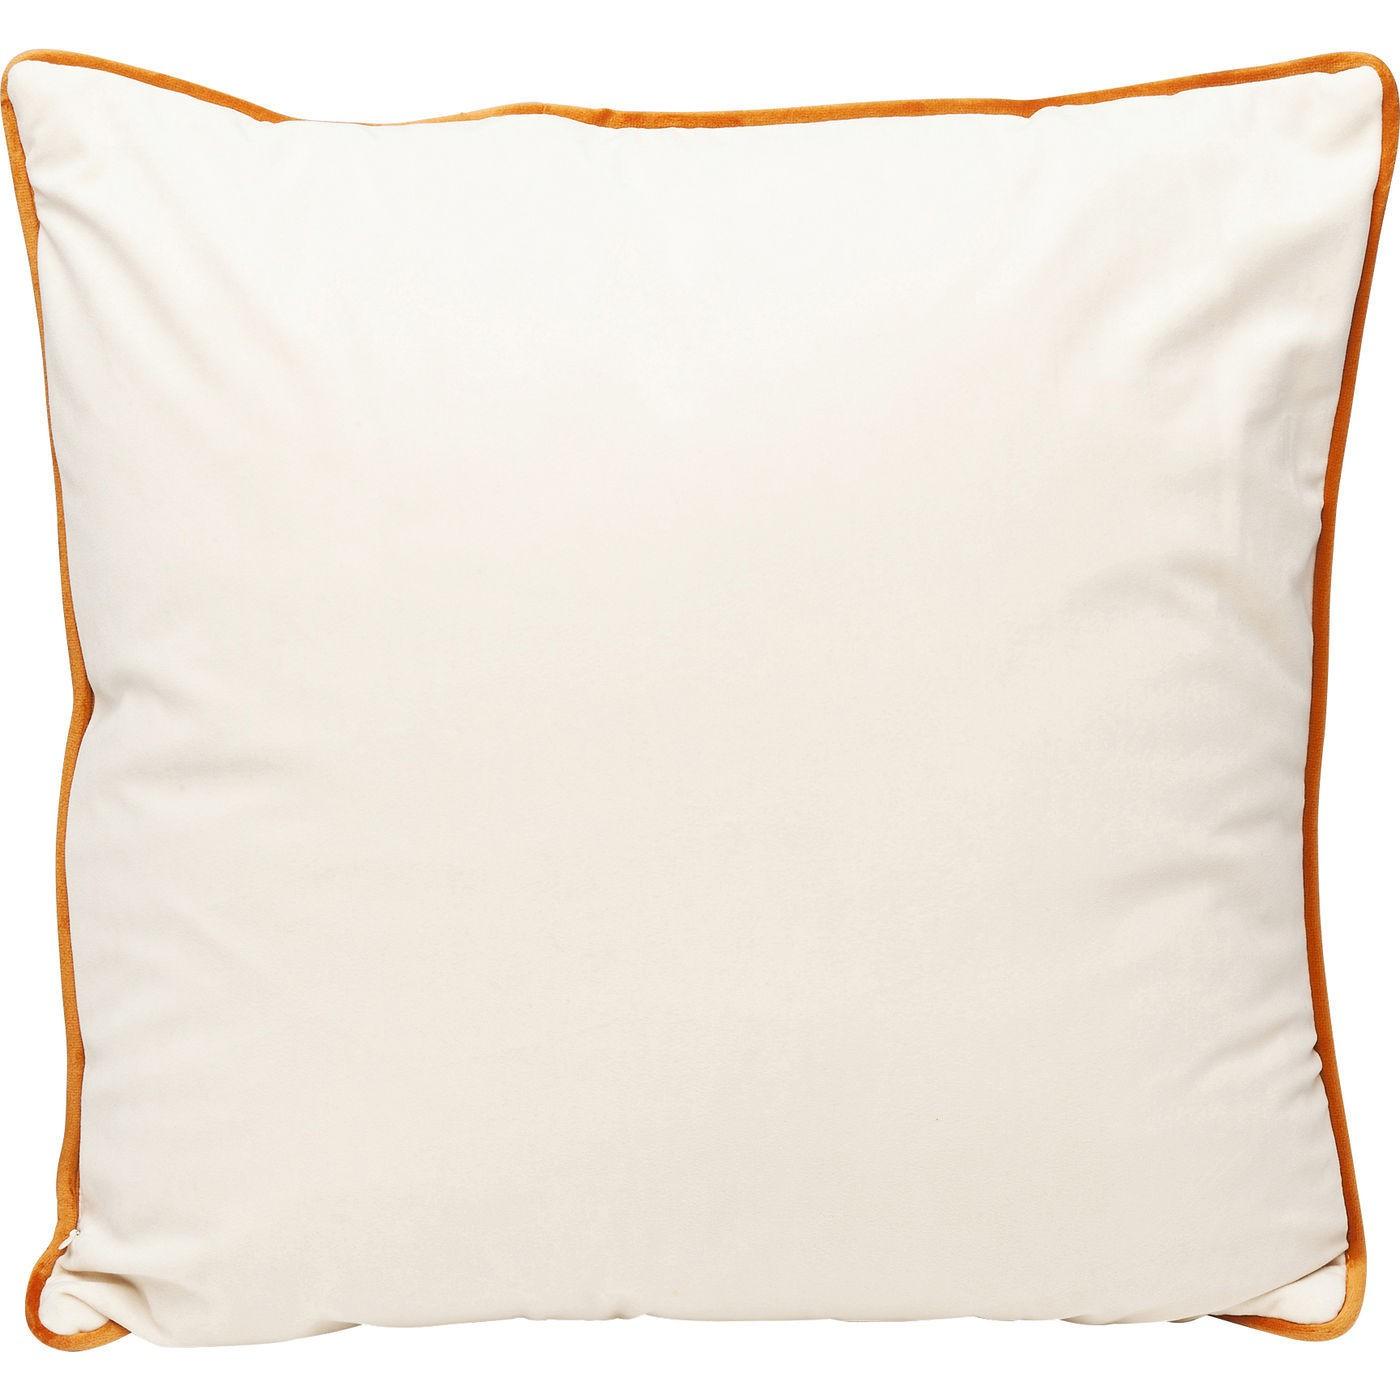 Coussin orange et blanc à sangles Kare Design